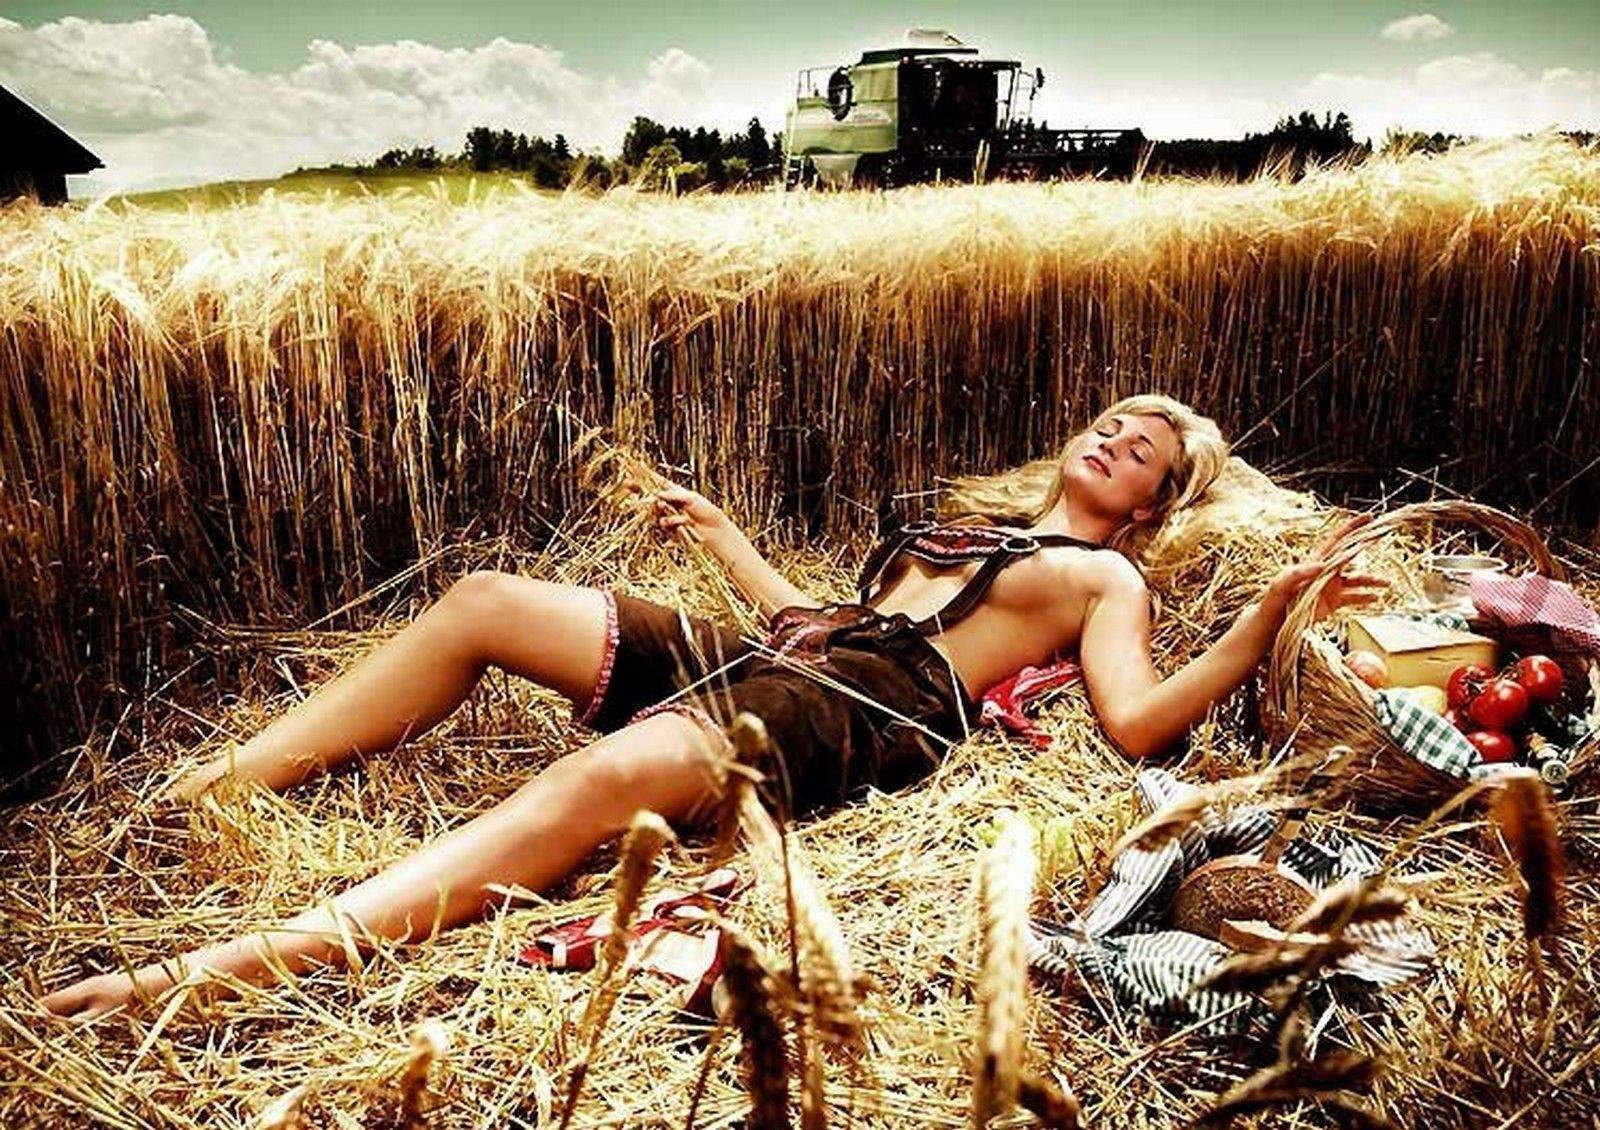 Фото турецкие деревенские девушки 7 фотография